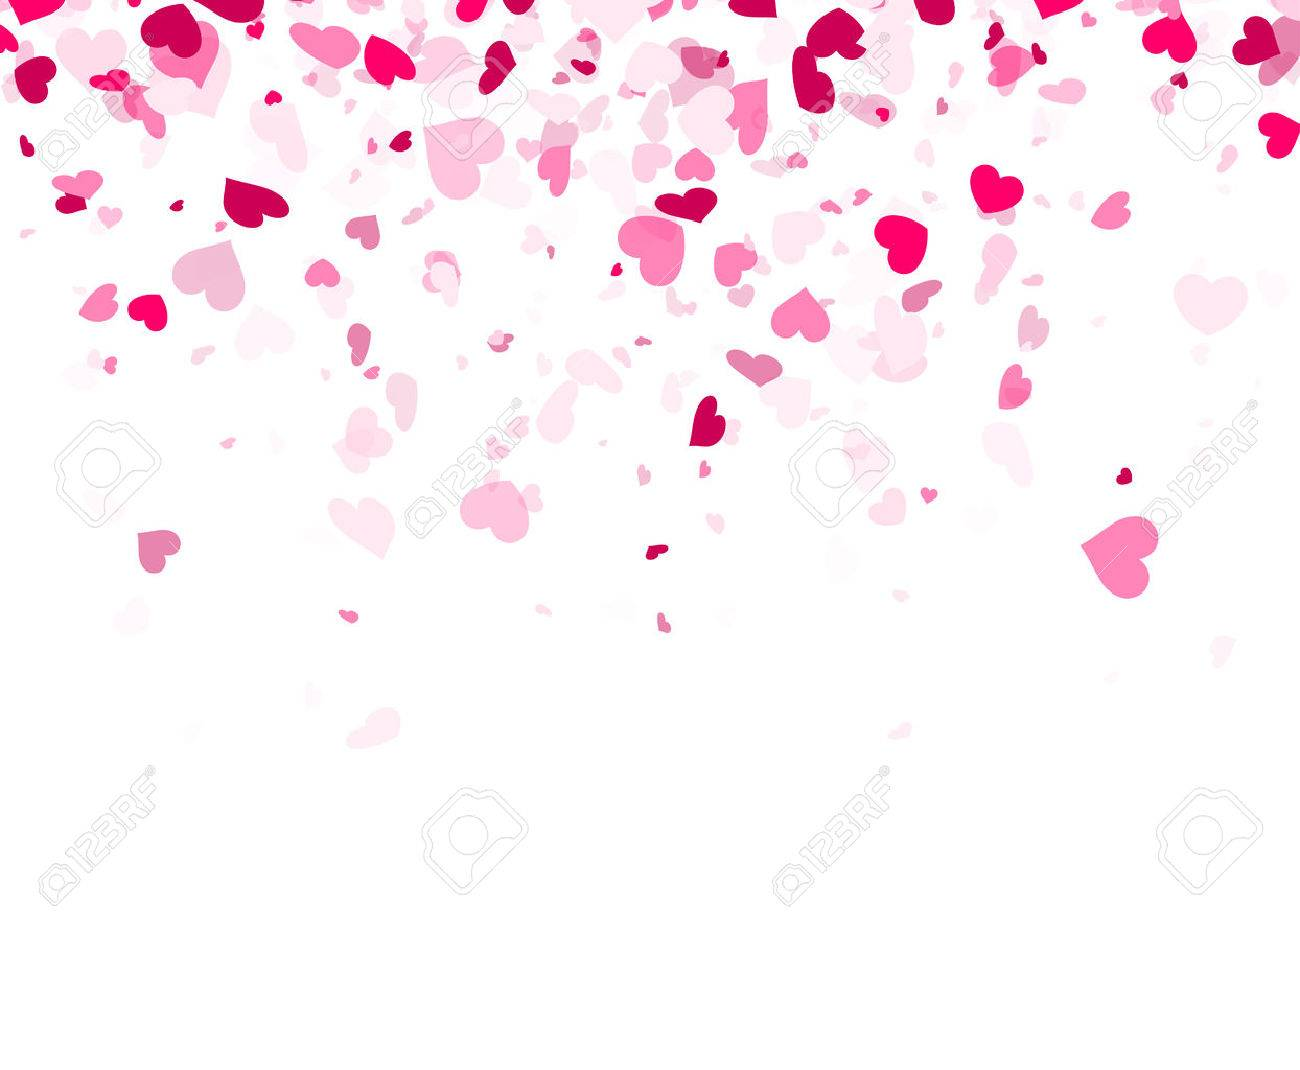 pink hearts photos